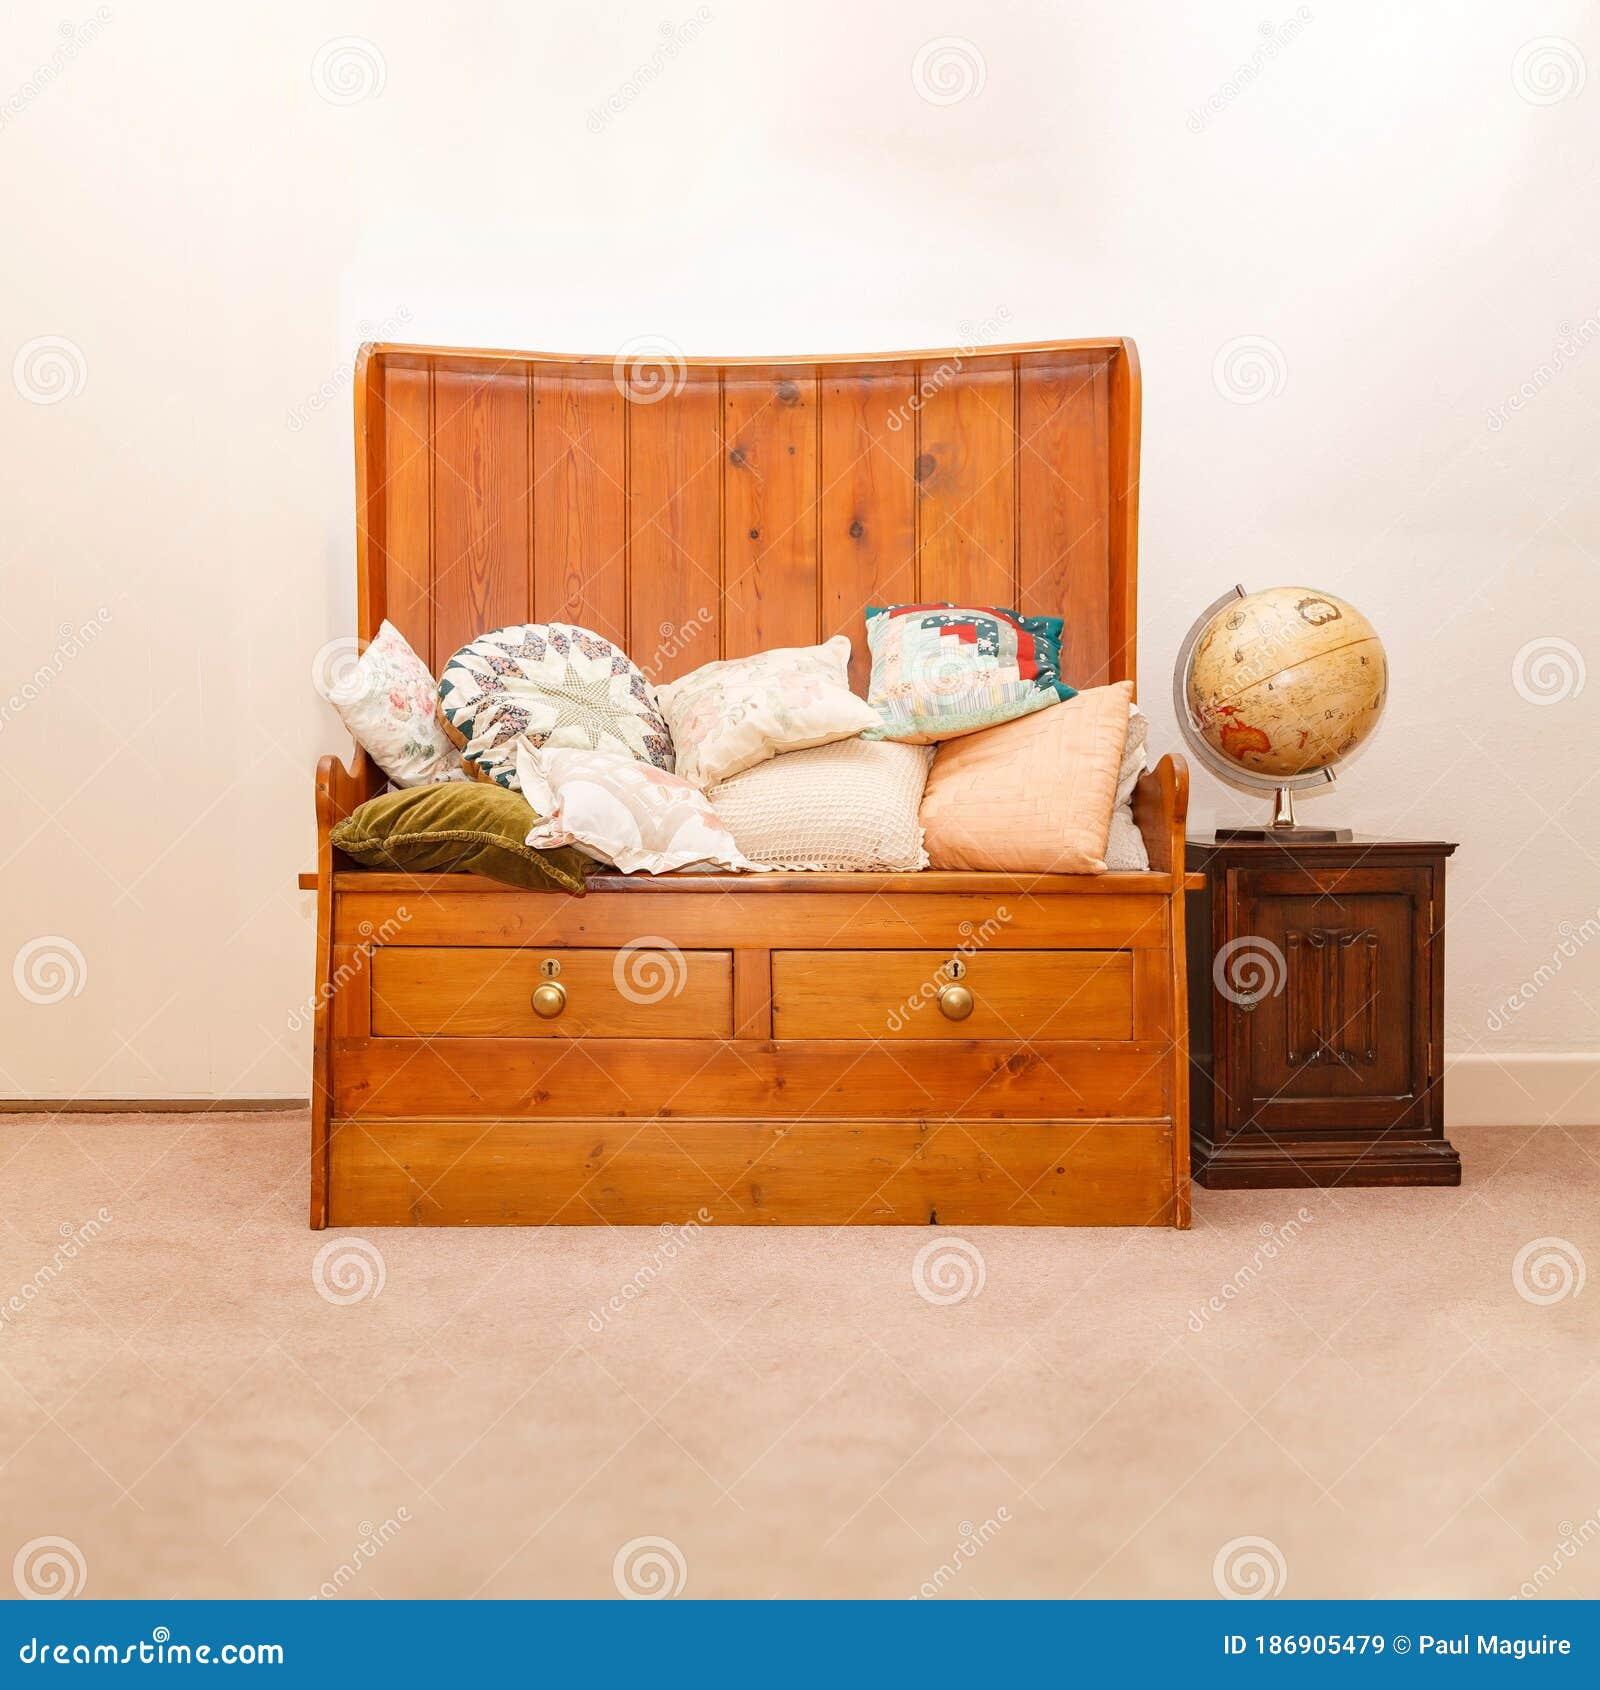 Antique Wooden Storage Bench Seat English Home Furnishing Stock Image Image Of Inside Furniture 186905479